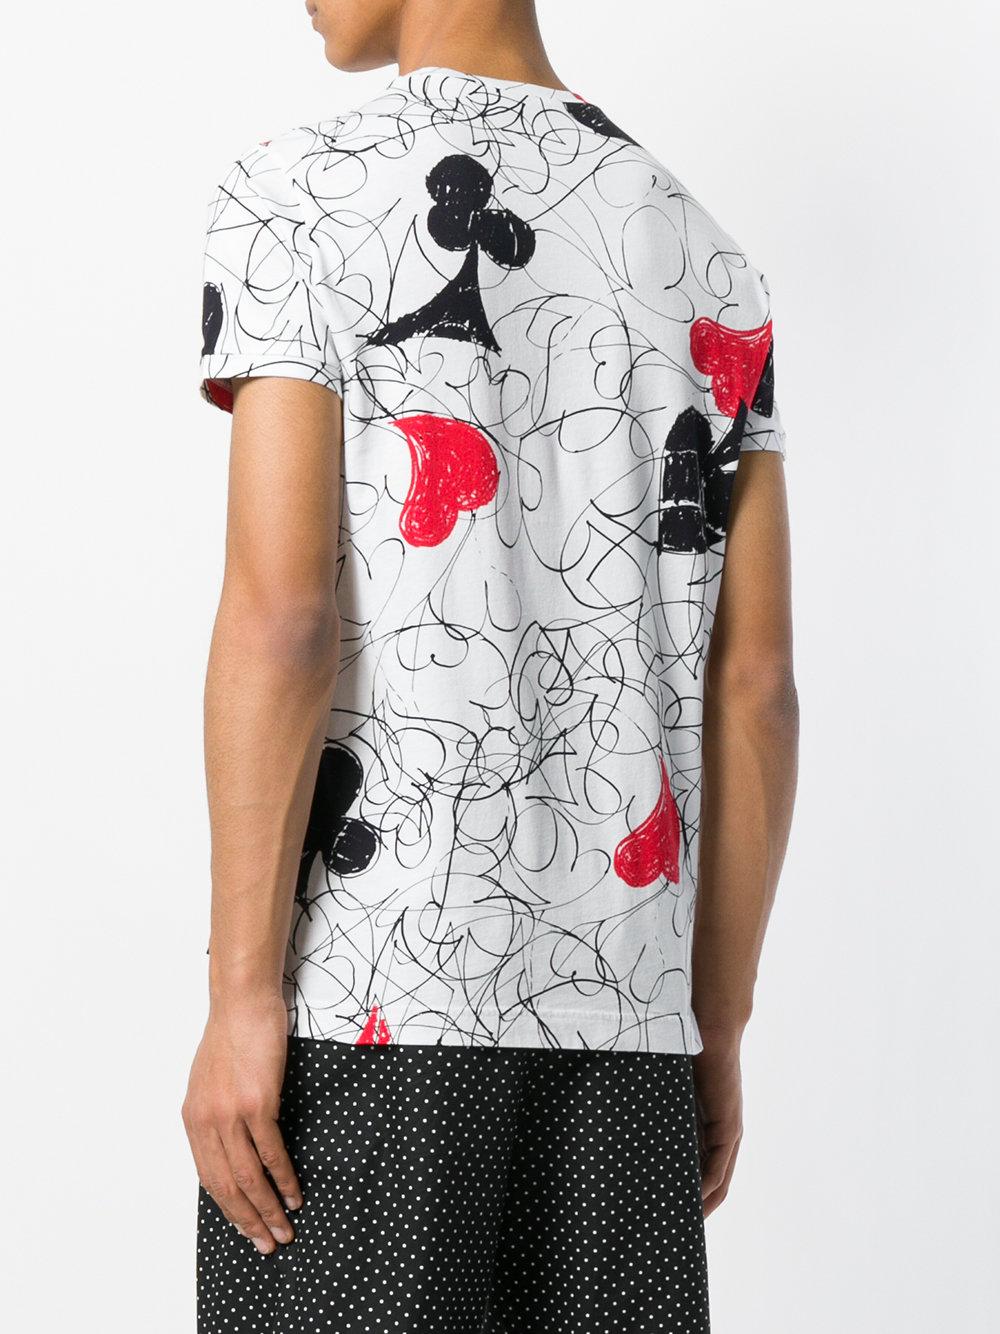 Camiseta de Vivienne Westwood